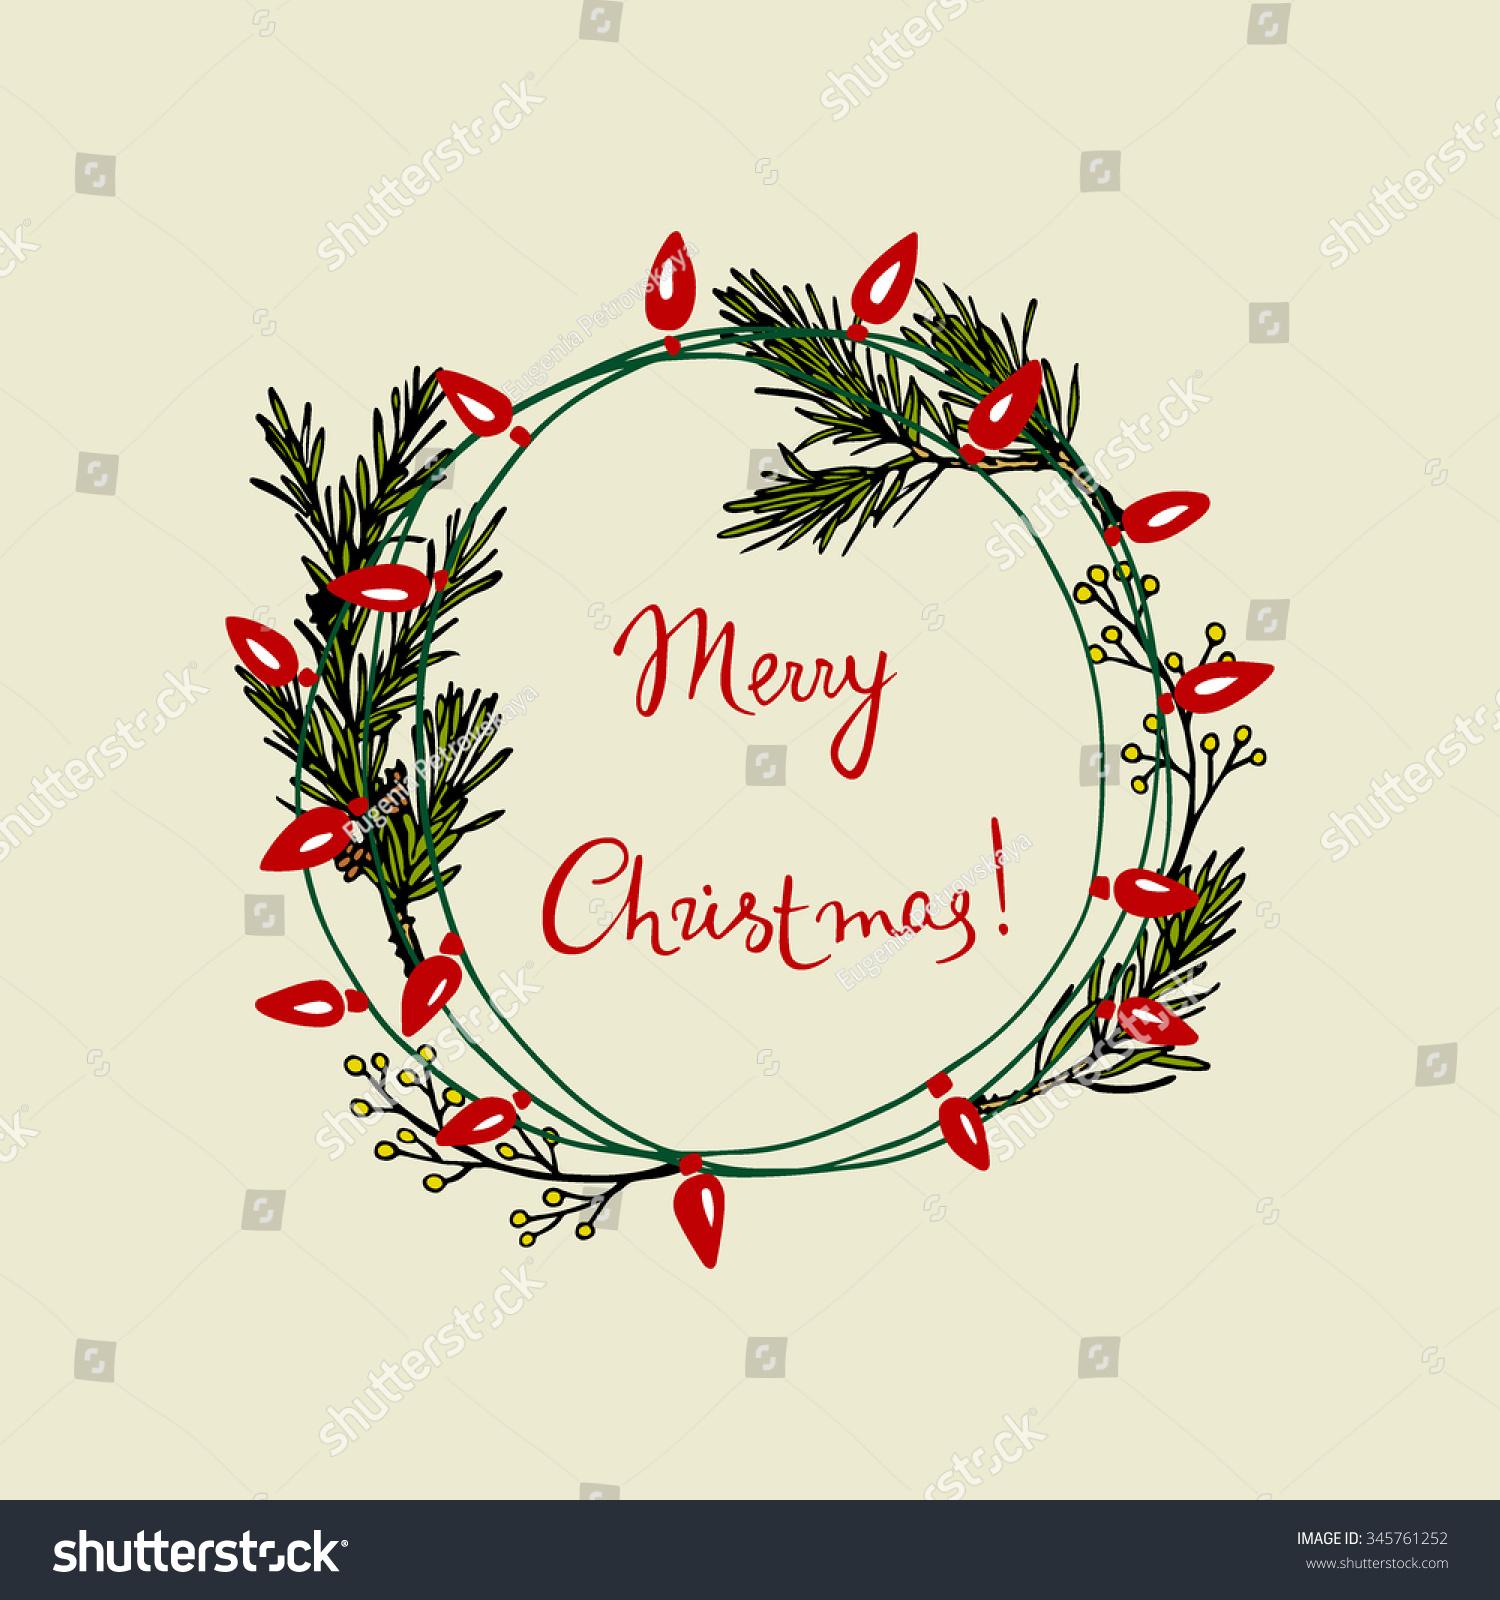 Vector Christmas Greeting Card Hand Drawn Stock Vector (Royalty Free ...